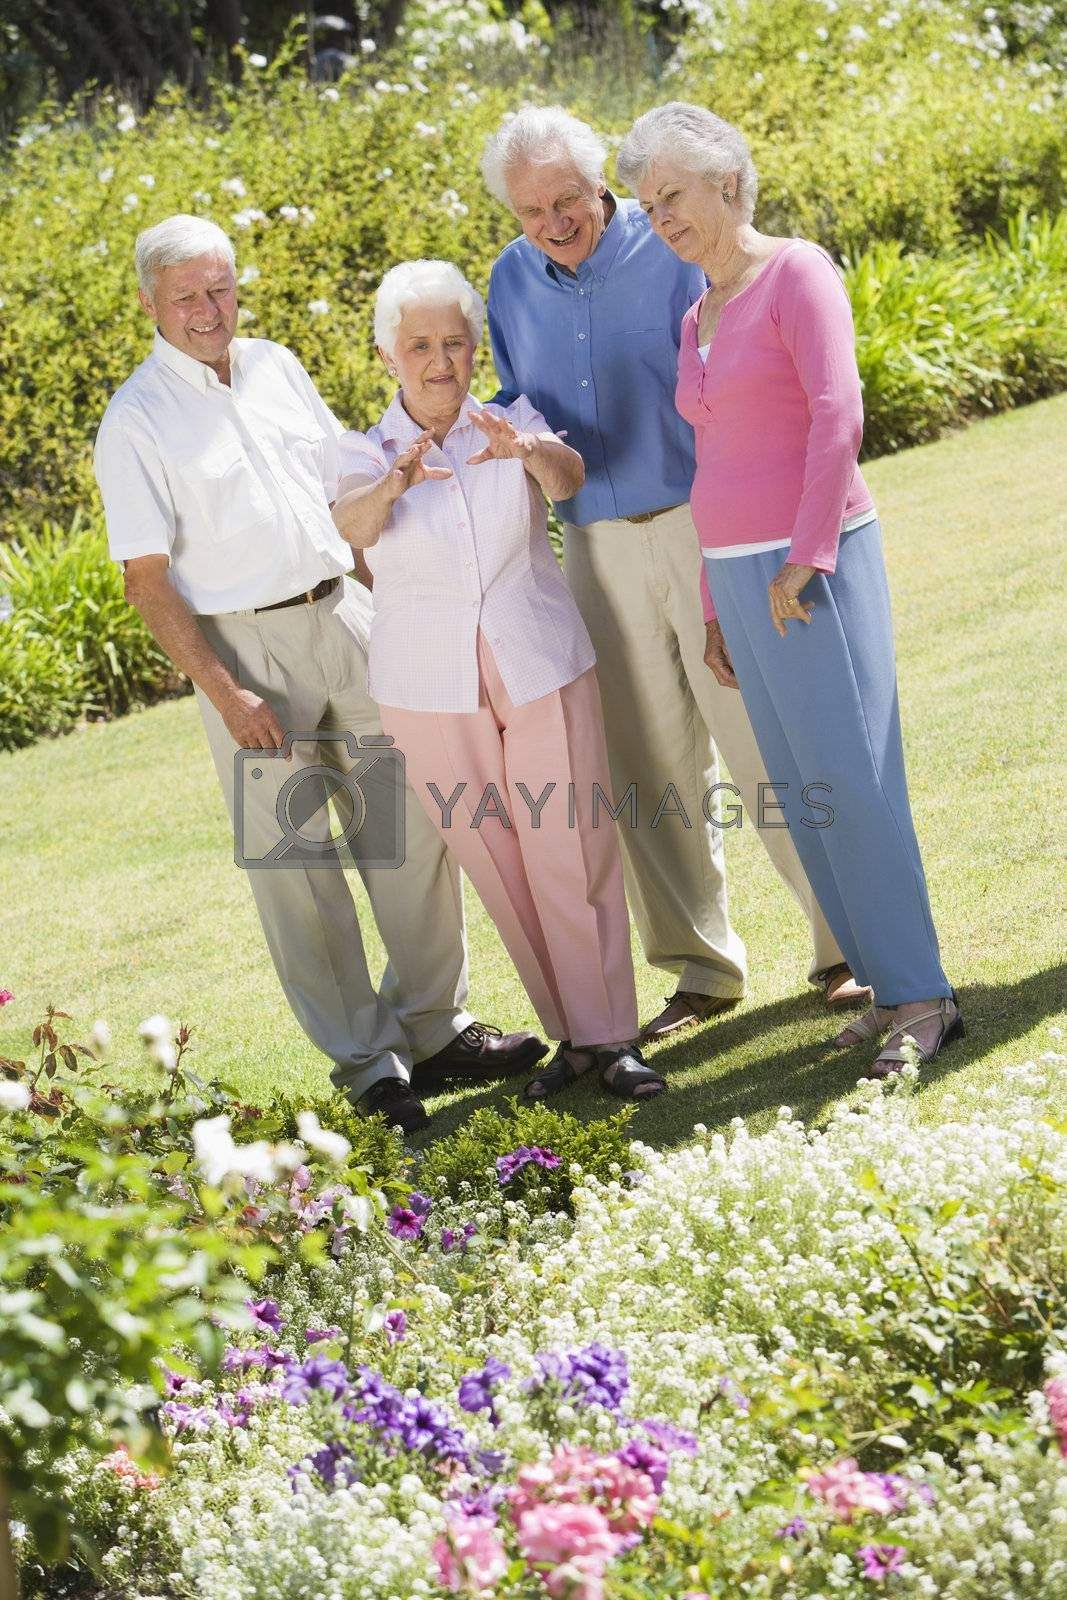 Group of senior friends in garden by MonkeyBusiness